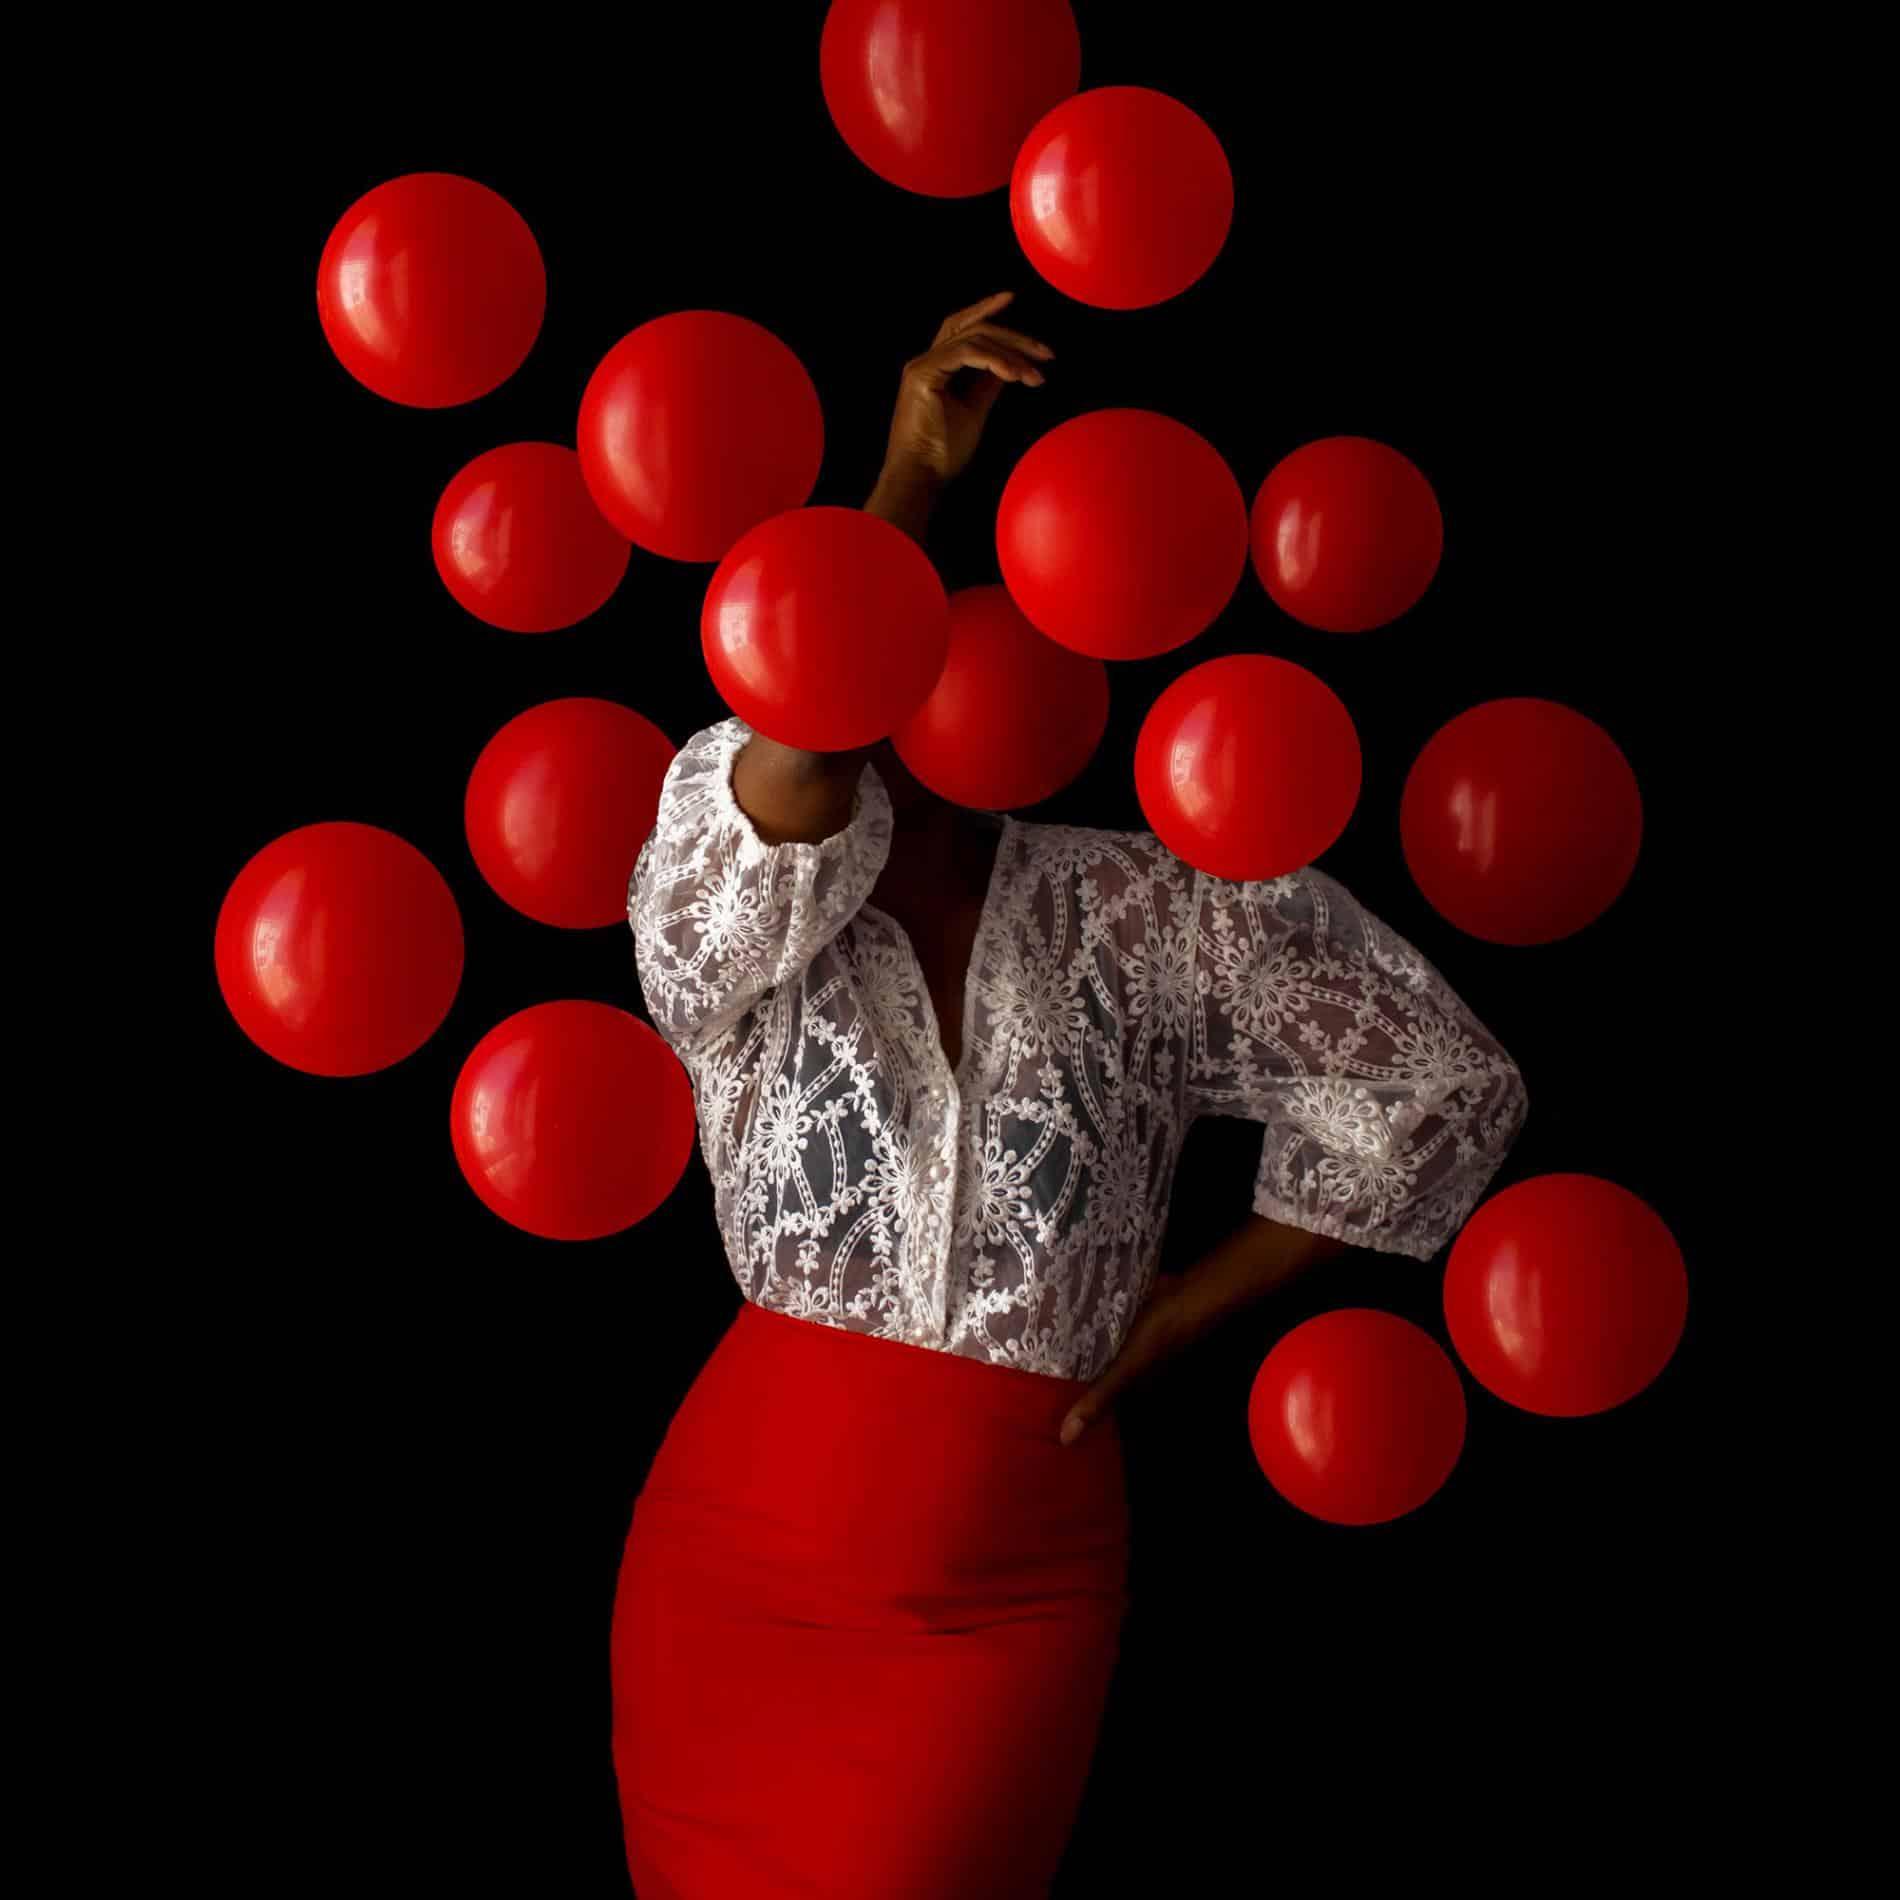 fares micue autoretrato globos red plus